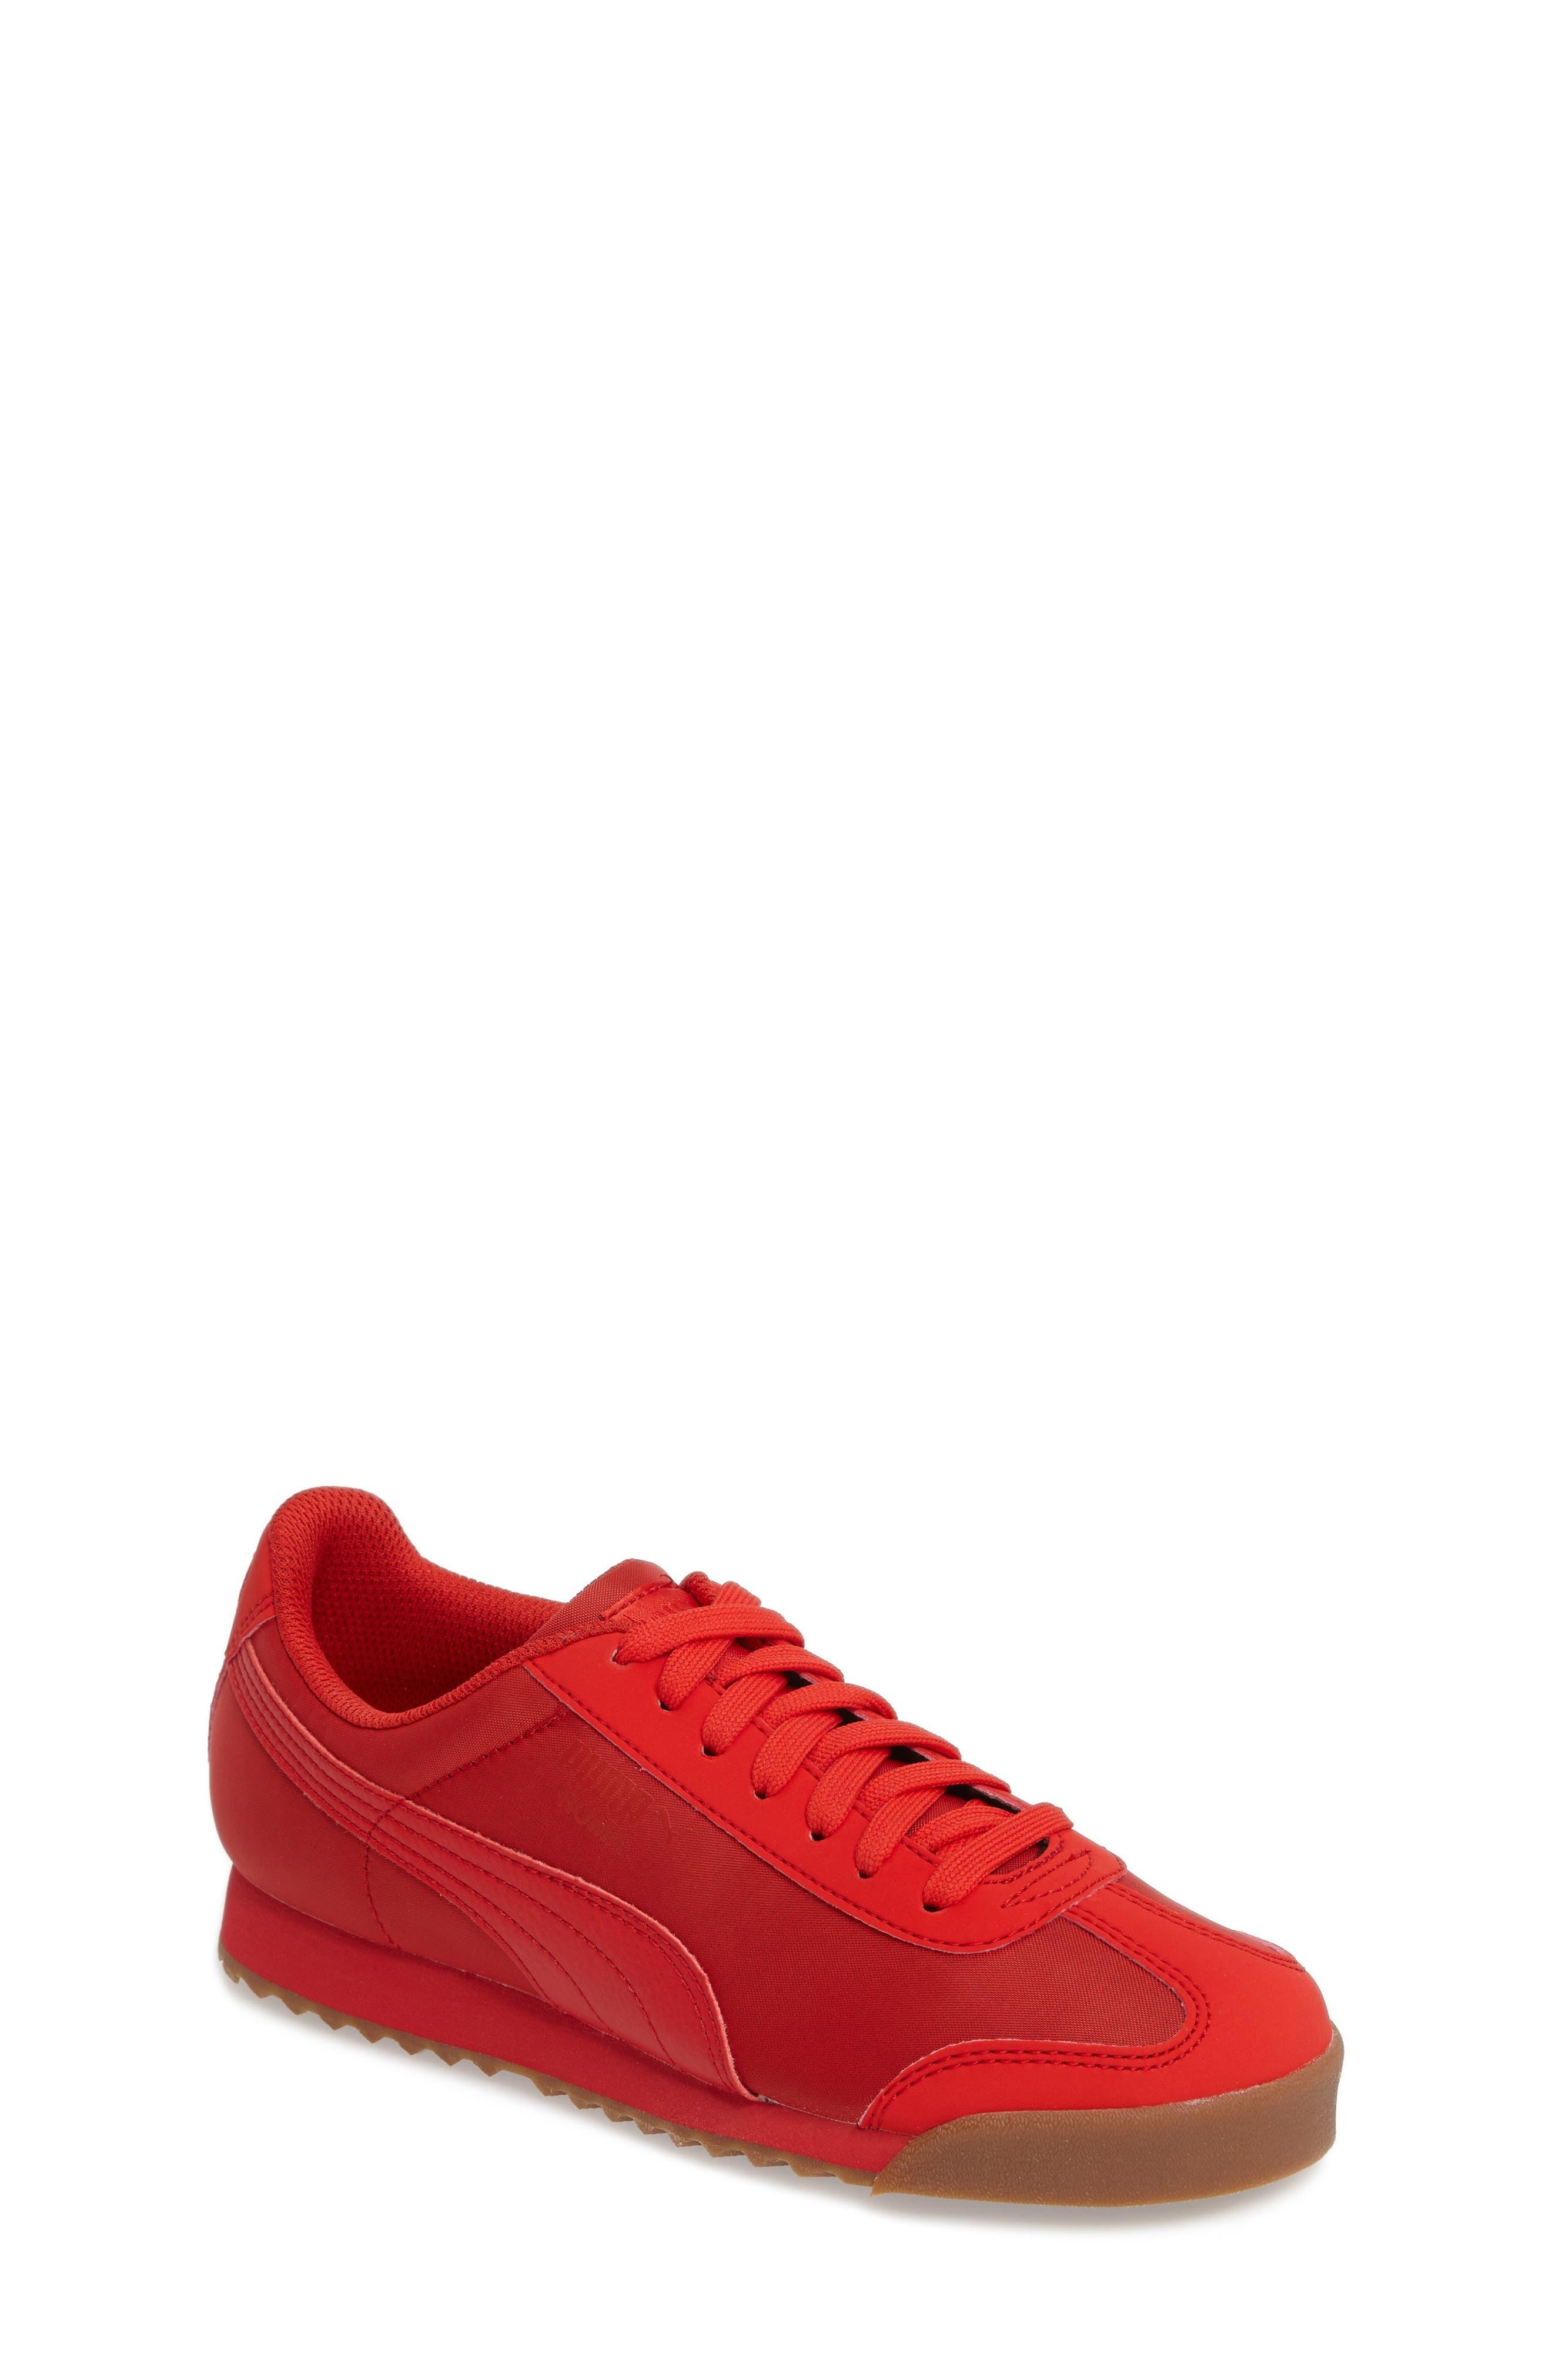 Main Image - PUMA Roma Basic Summer Sneaker (Big Kid)